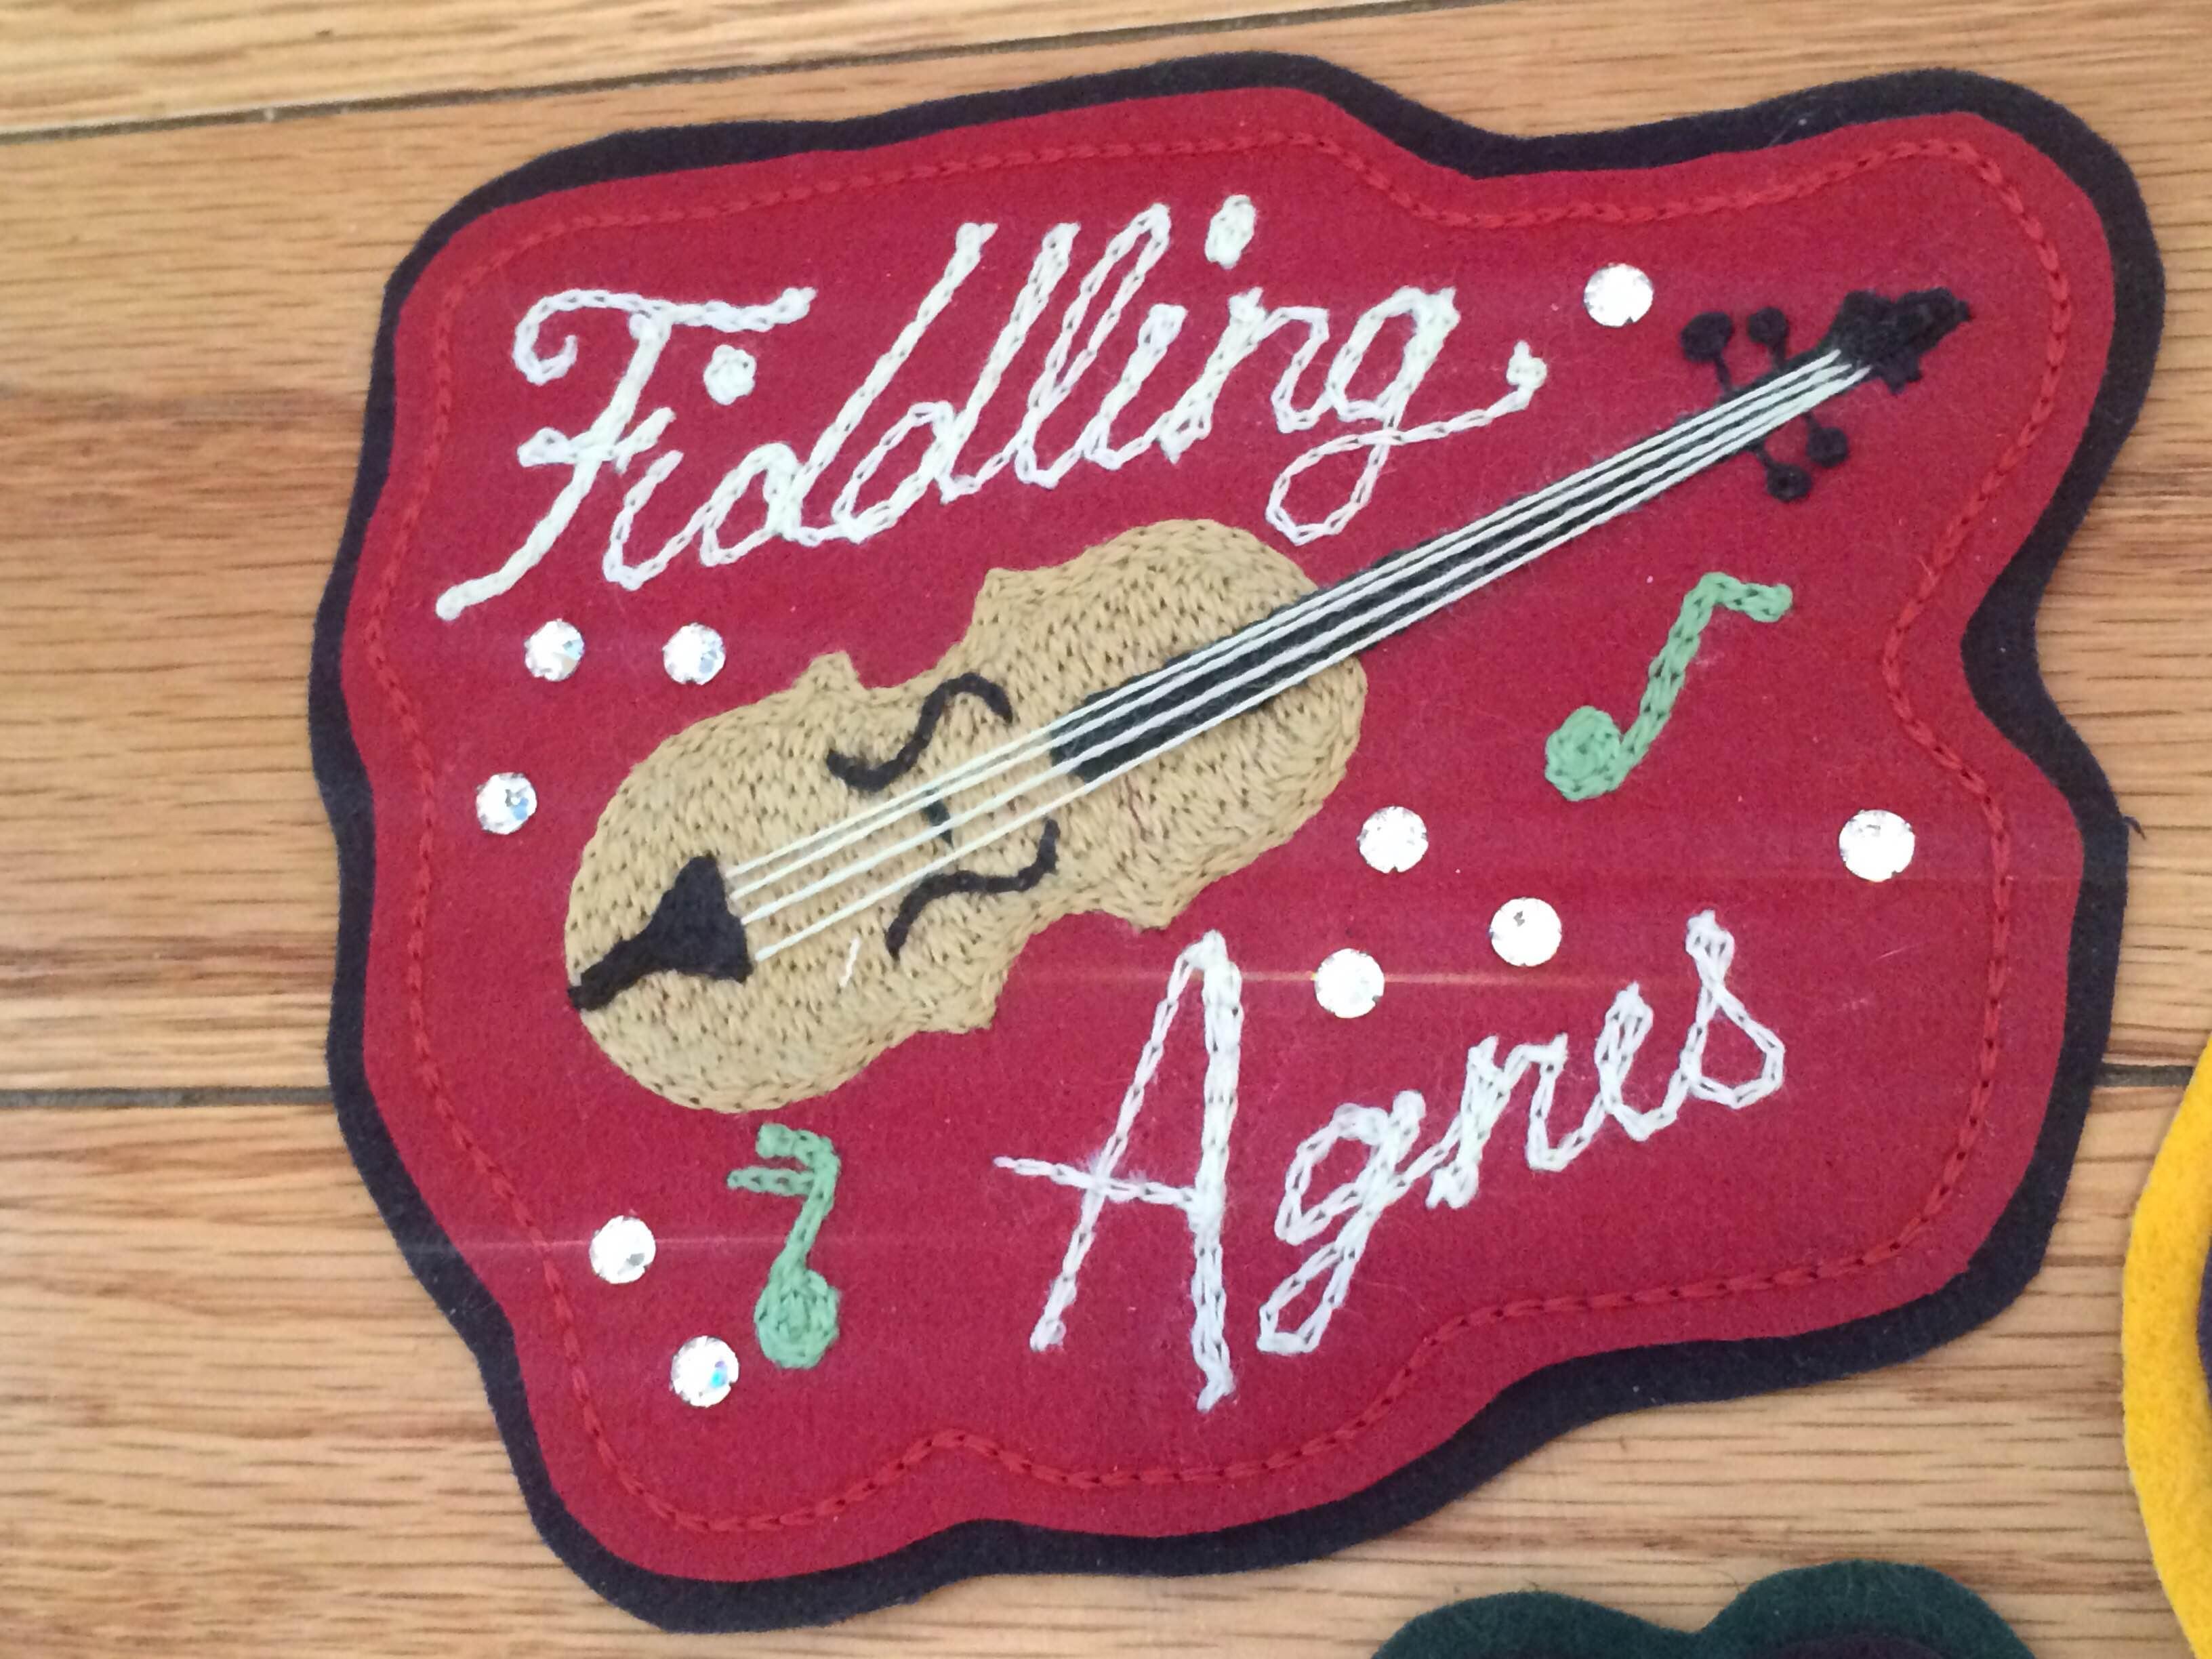 Fiddling Agnes